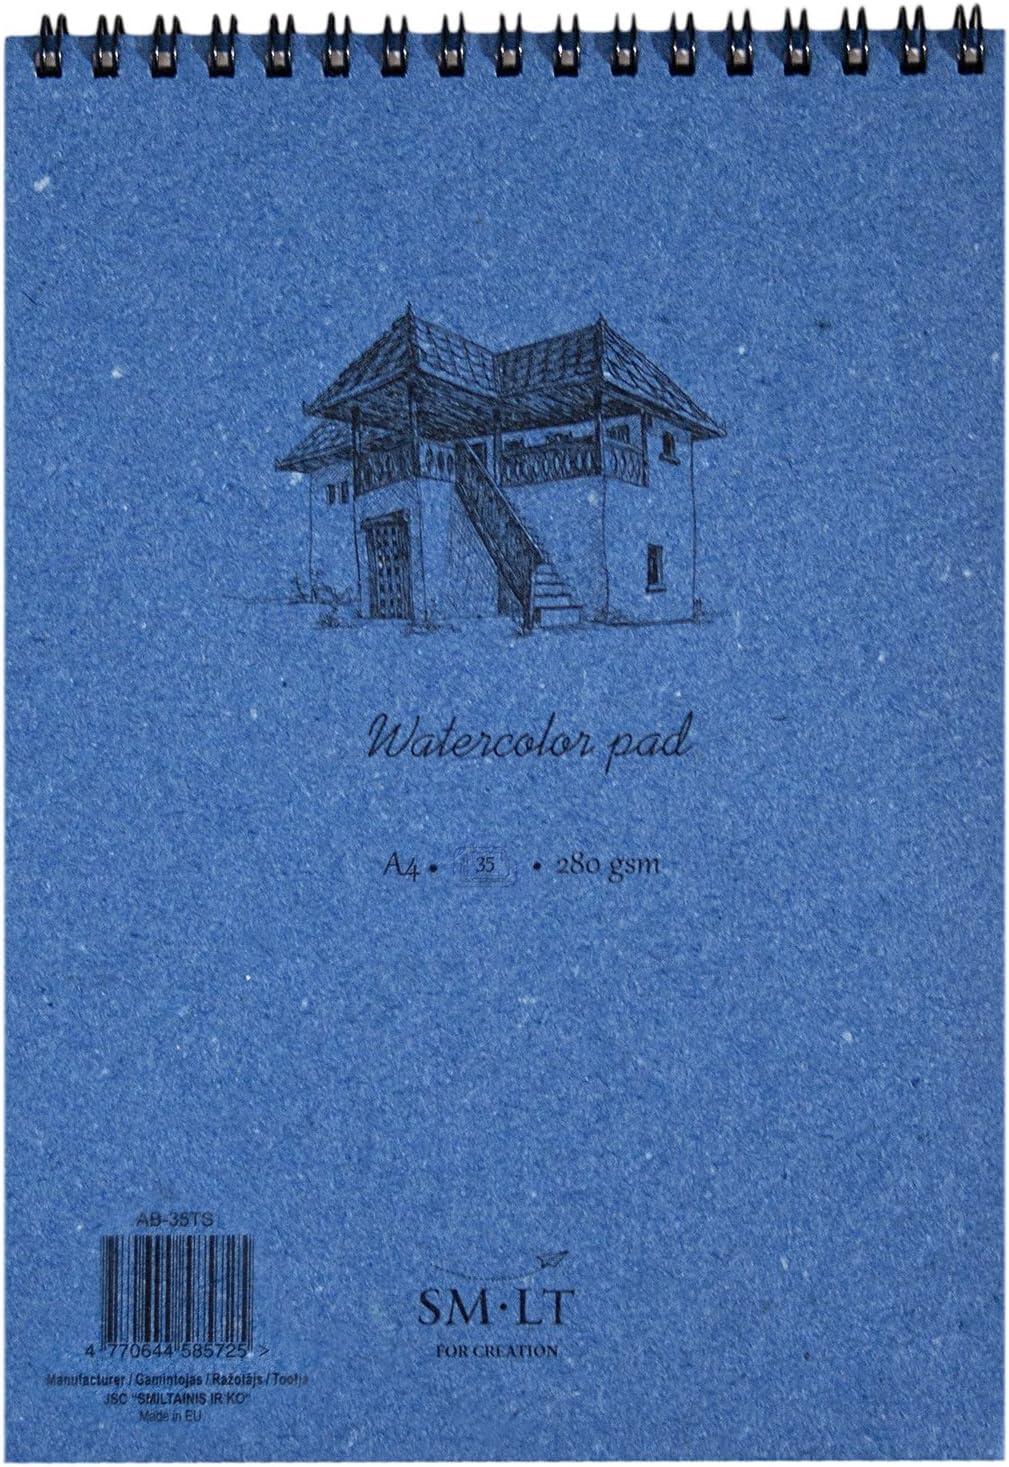 35 Pages Blue Natural White Paper SM.LT AB-35TS Authentic Line A4 Watercolour Pad 280 GSM